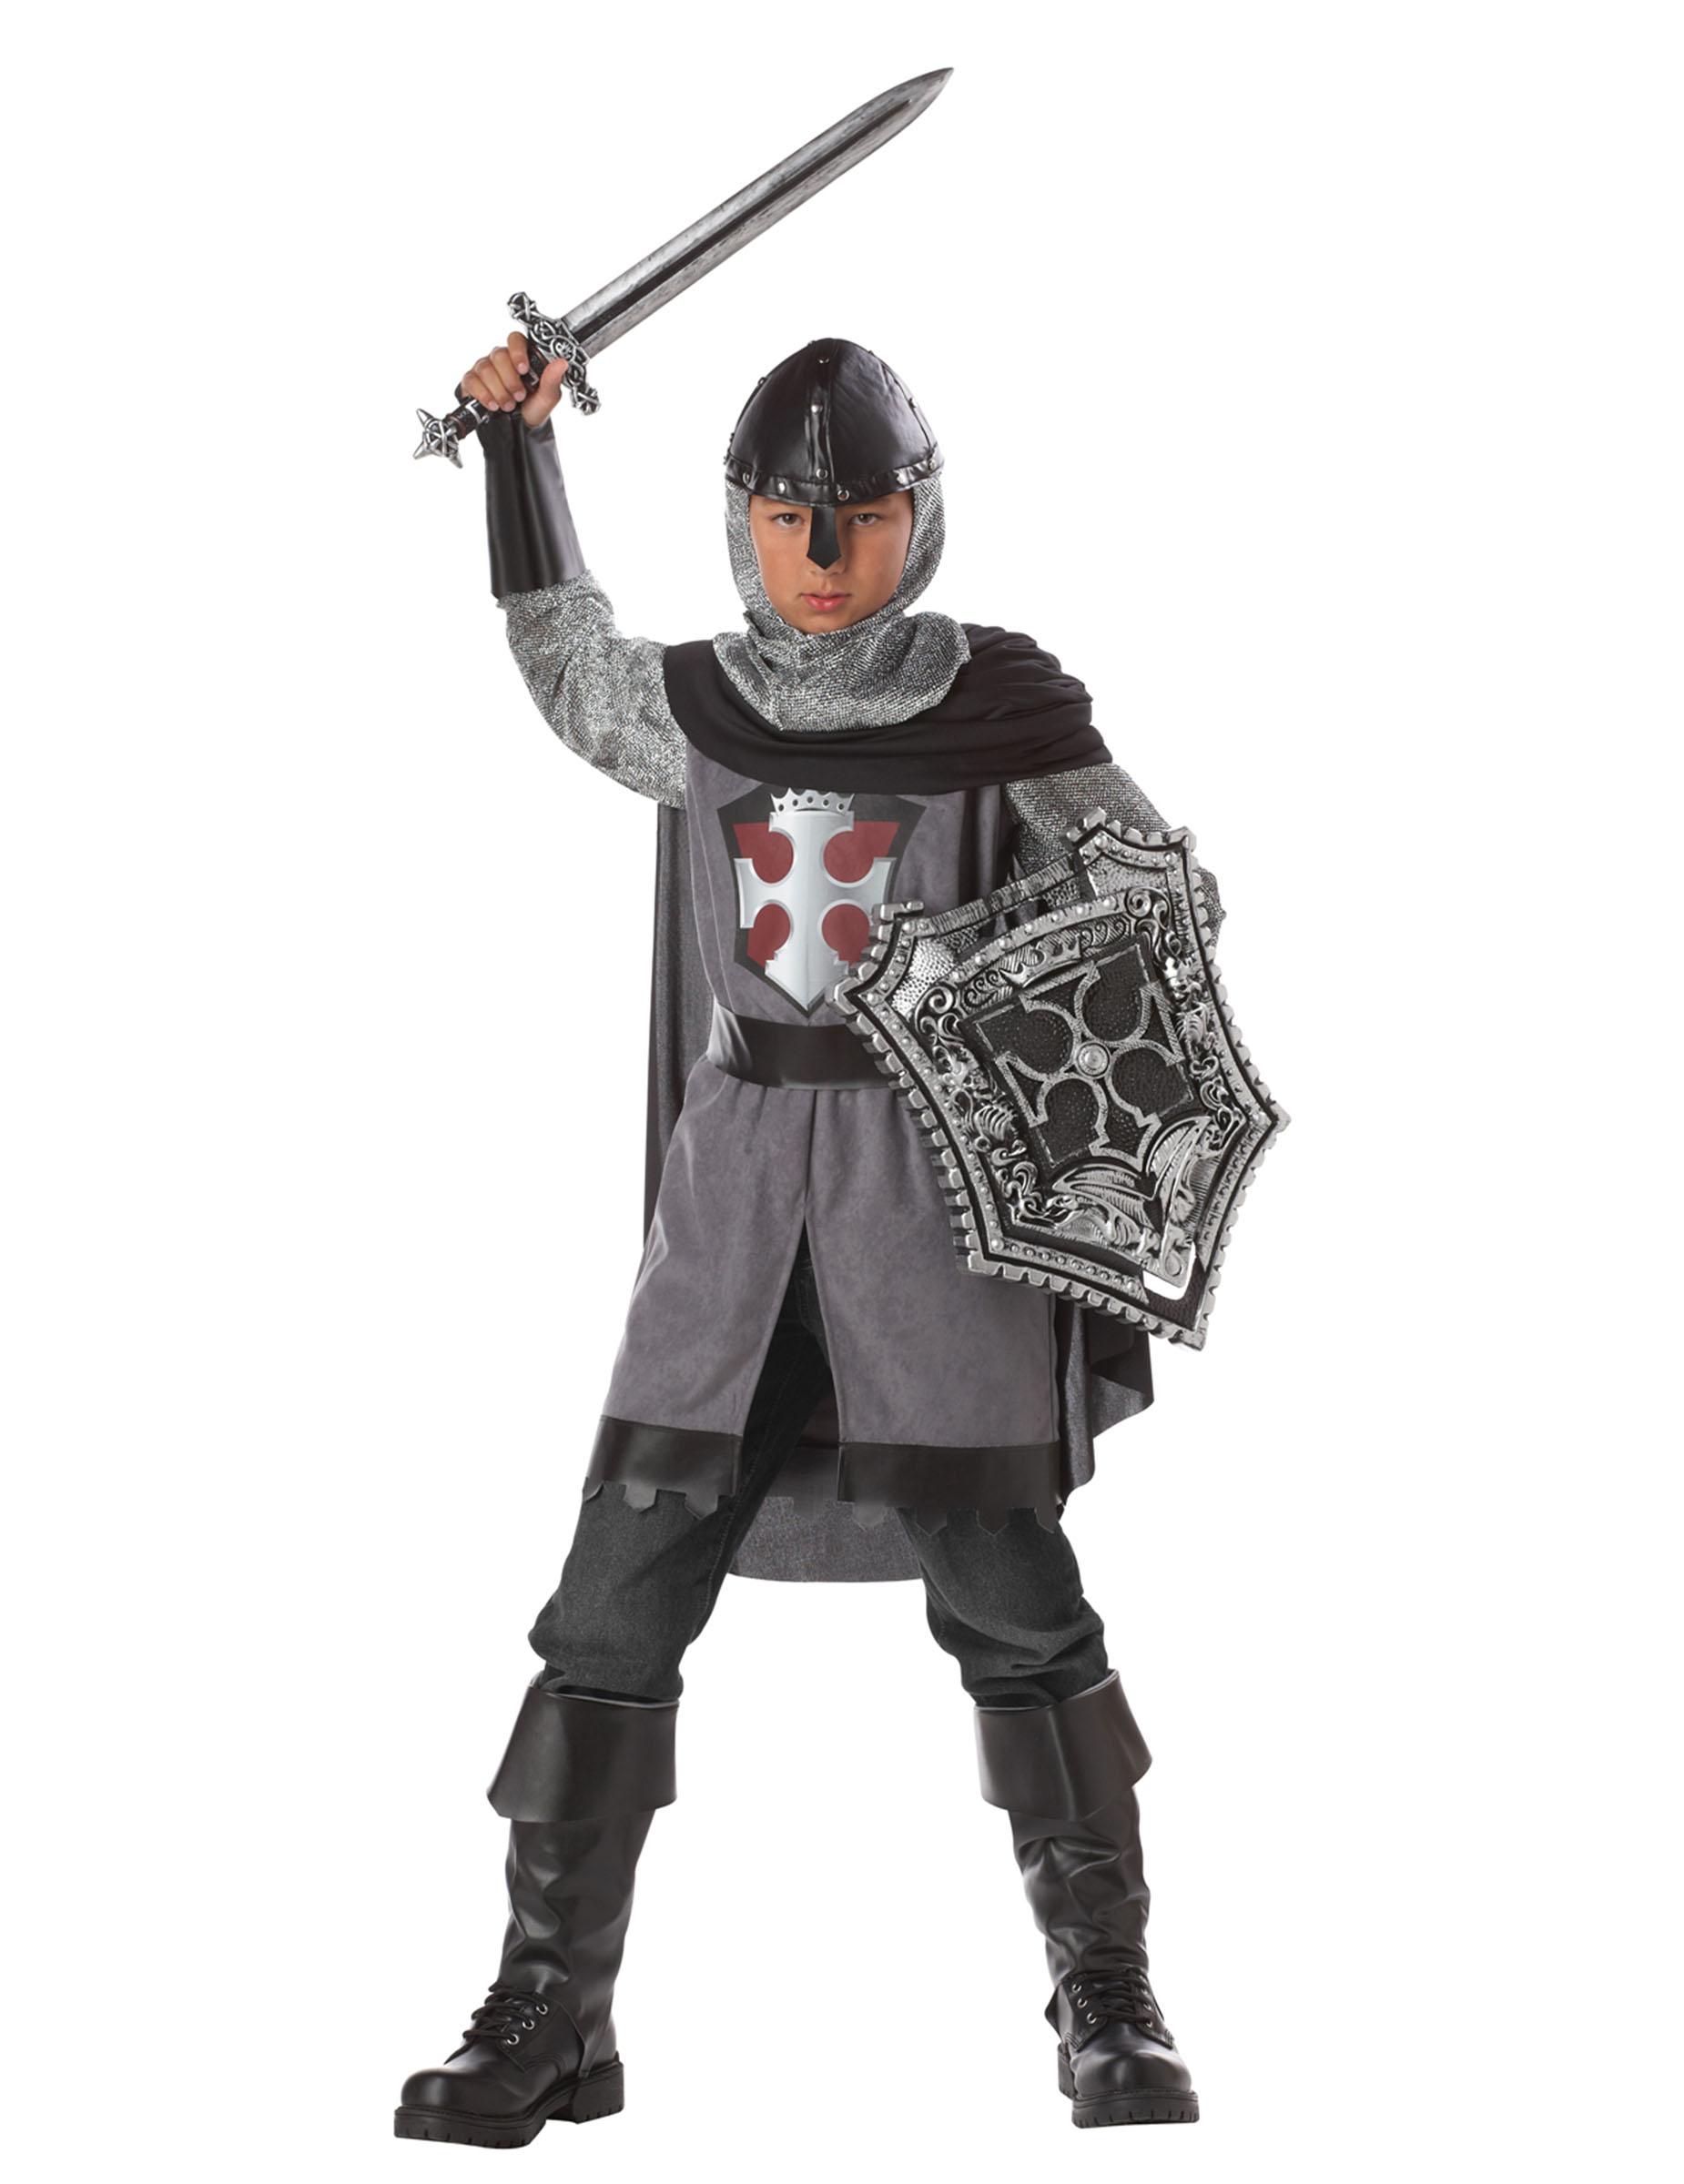 Mutiger Drachenjager Kostum Fur Jungen Silbergrau Gunstige